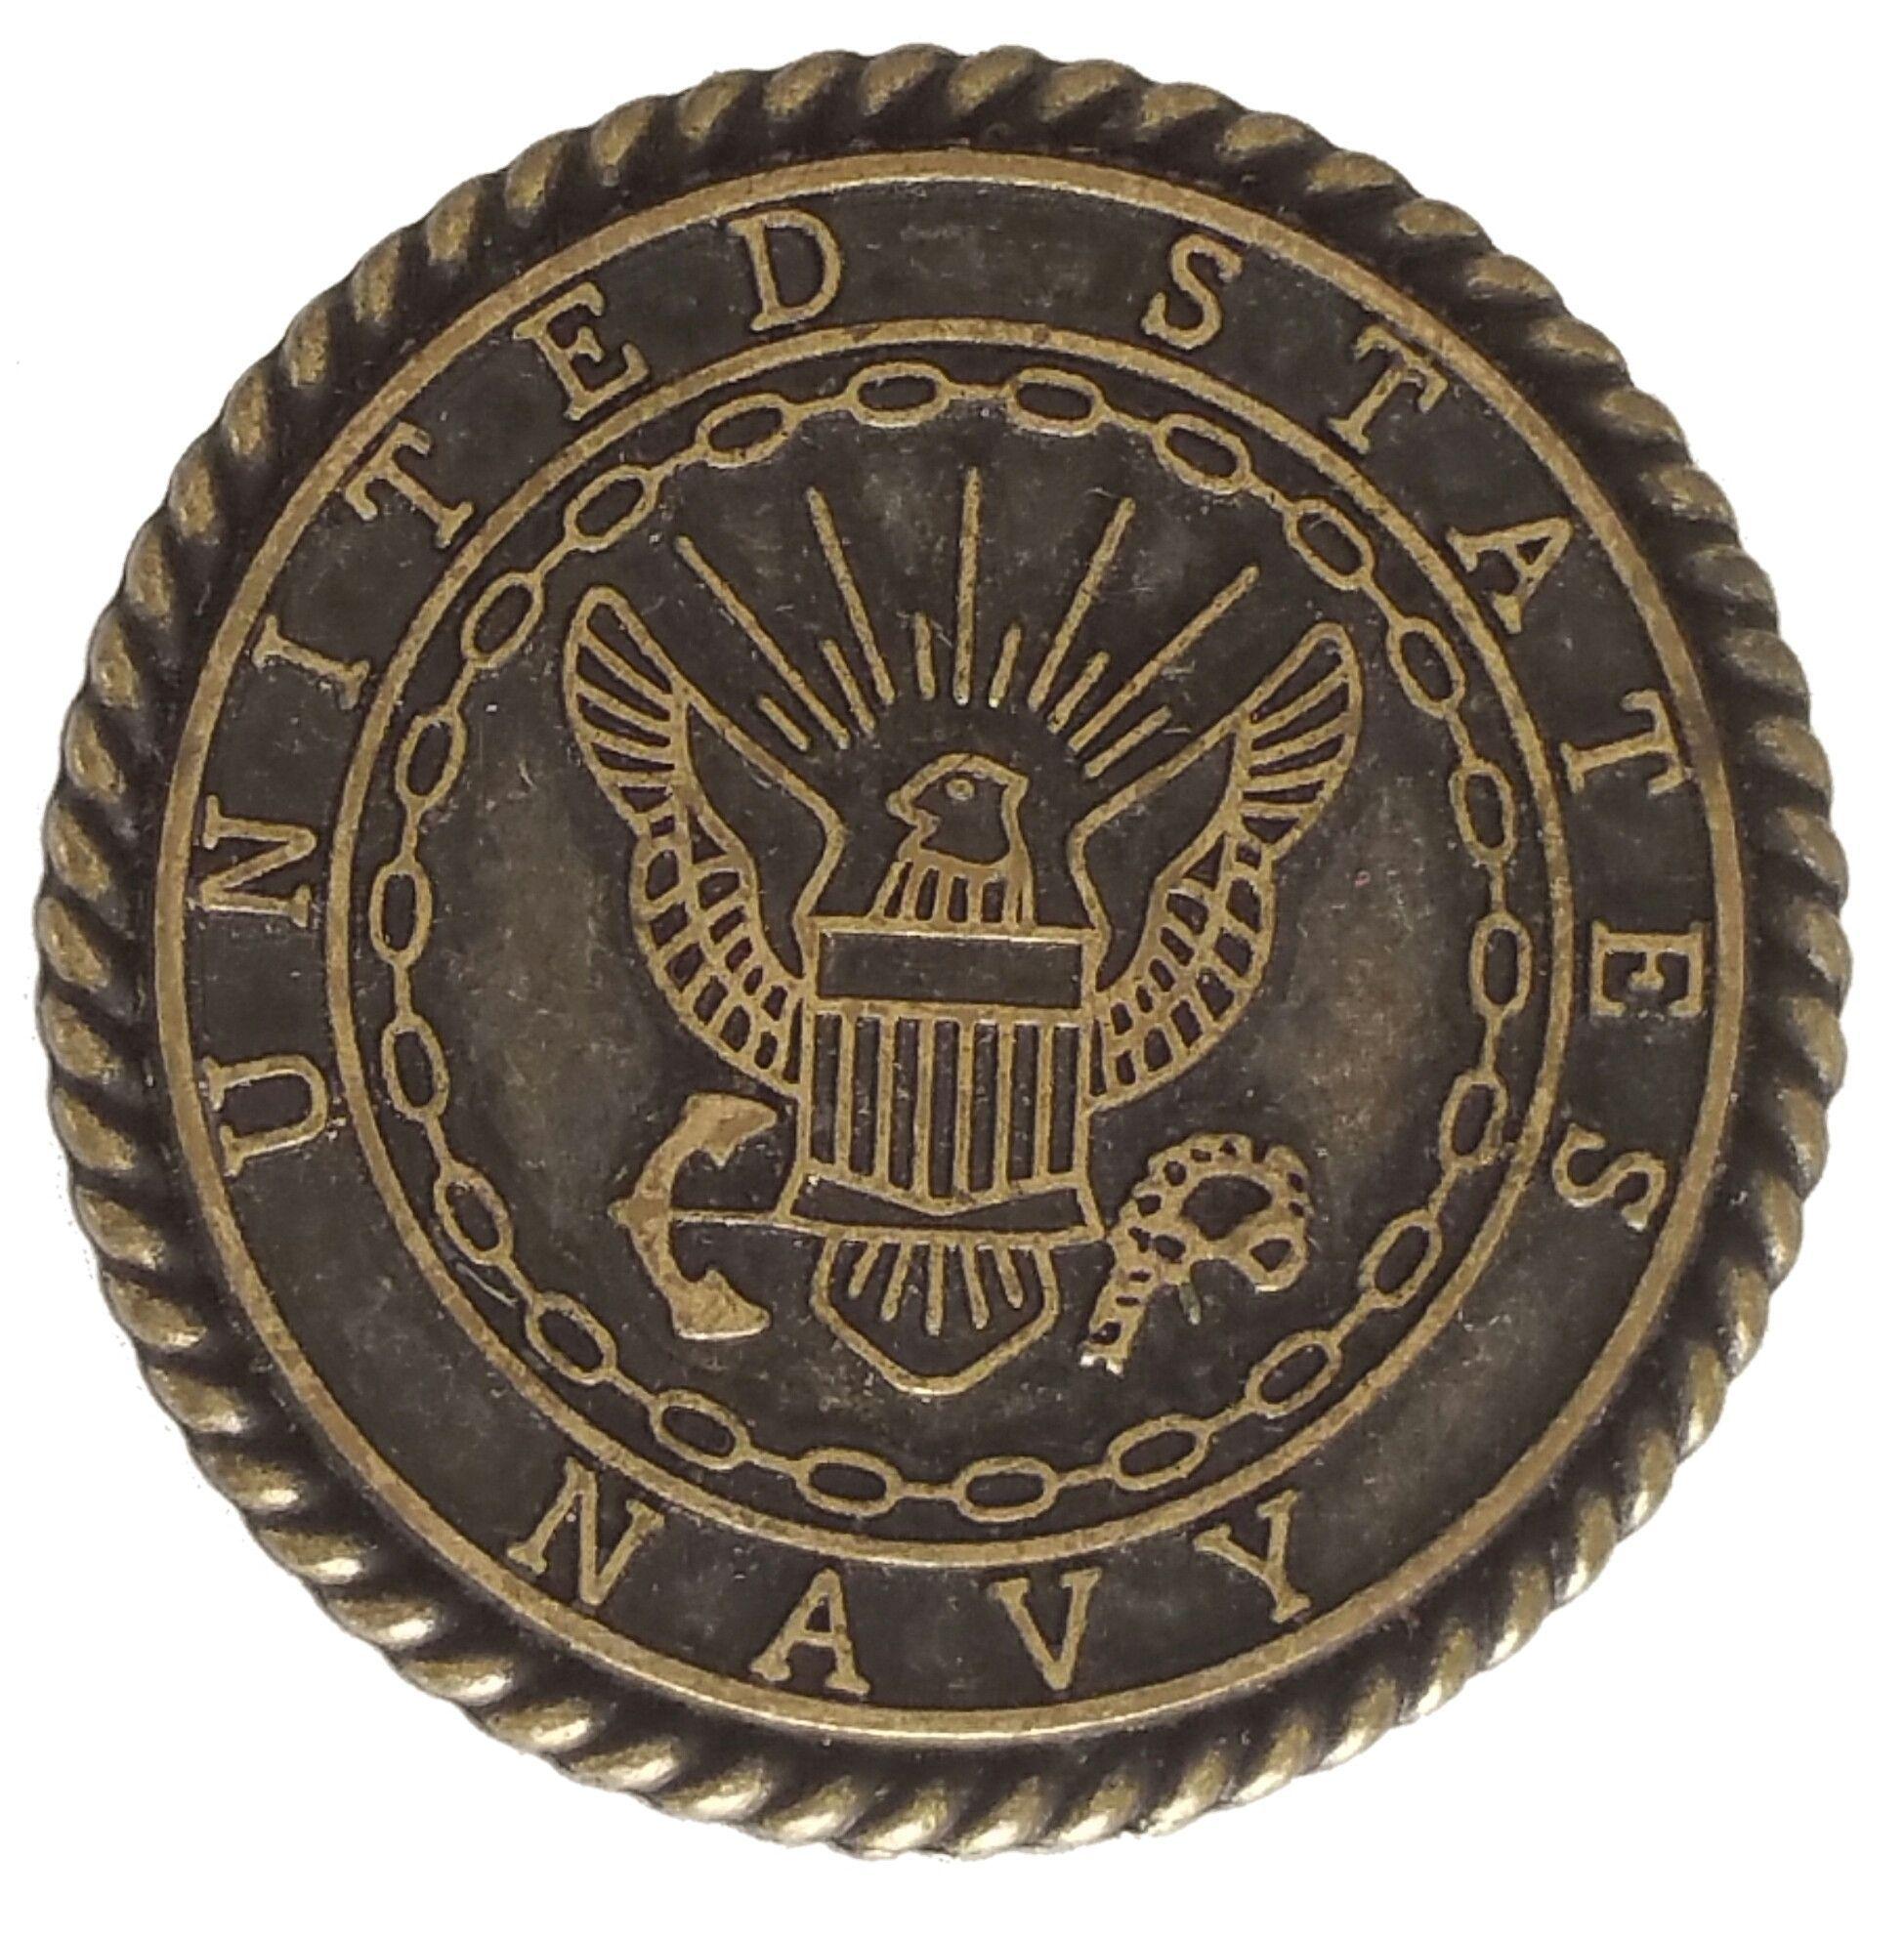 5440 Cc 1 Quot Us Navy Seal Emblem Antique Brass Decorative